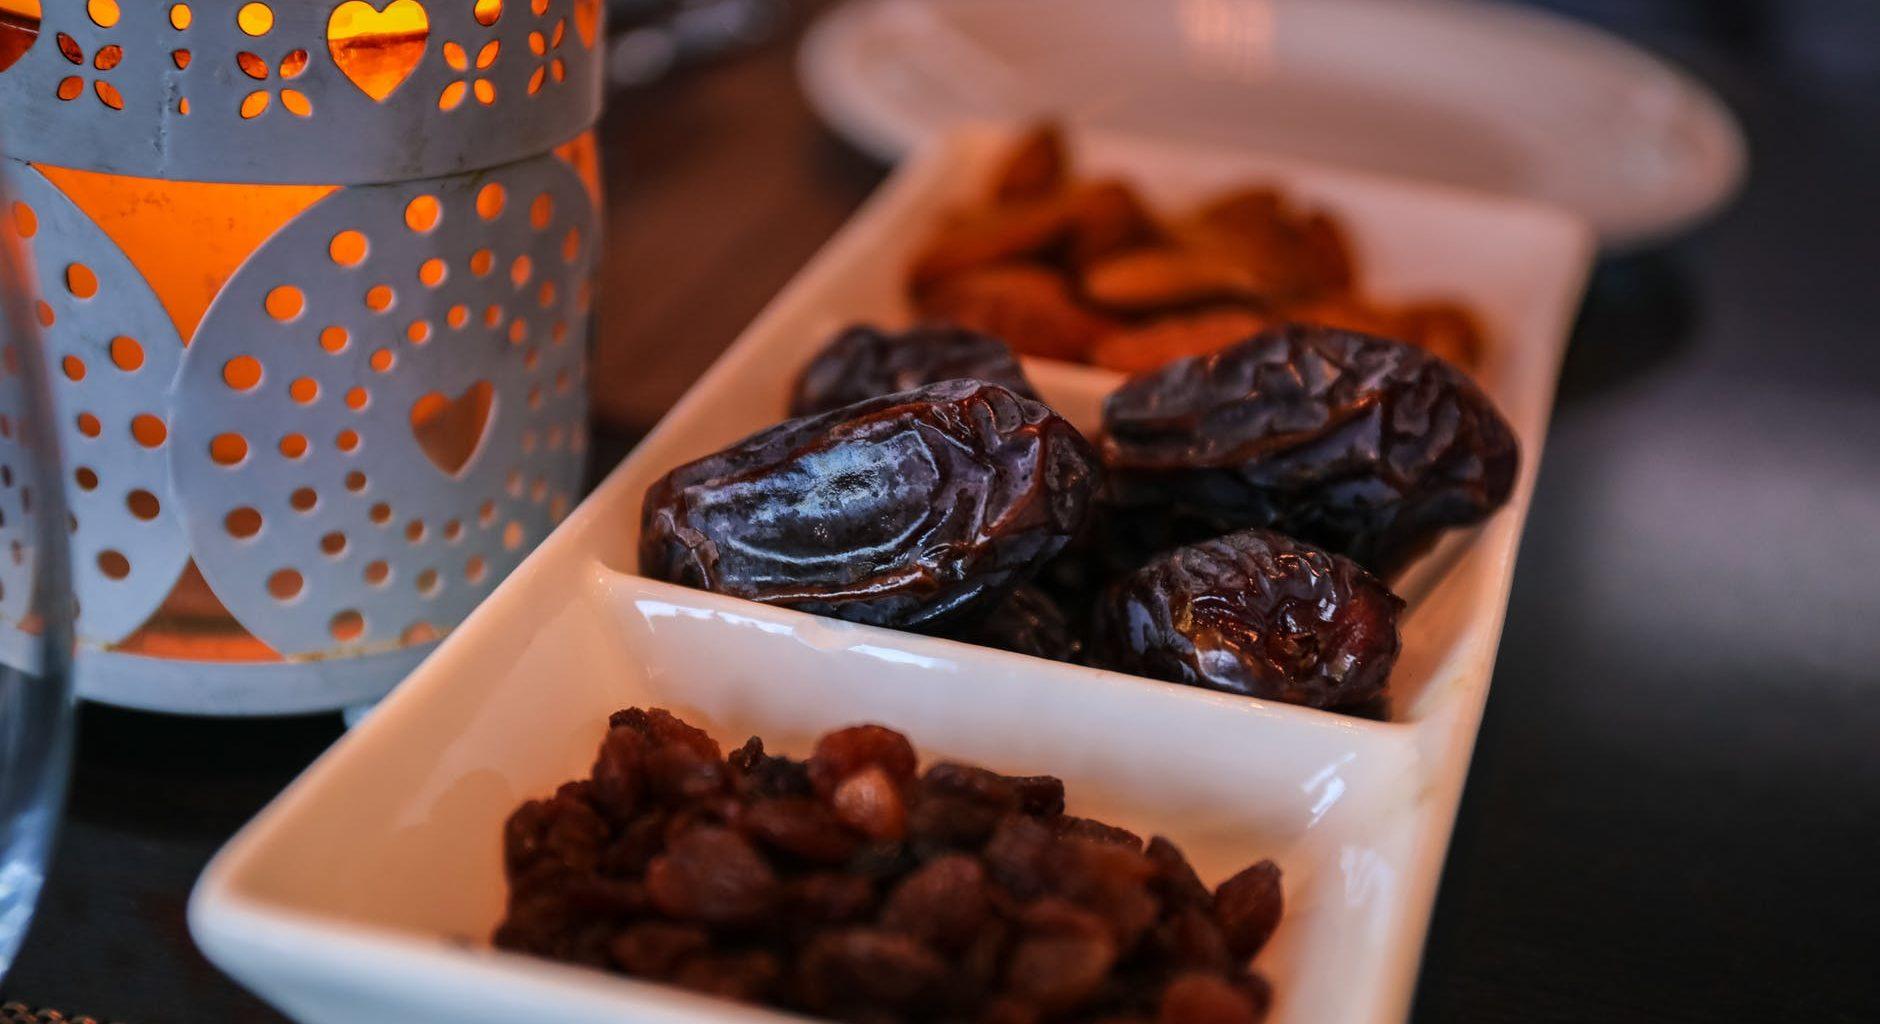 close up photo of raisins and dates